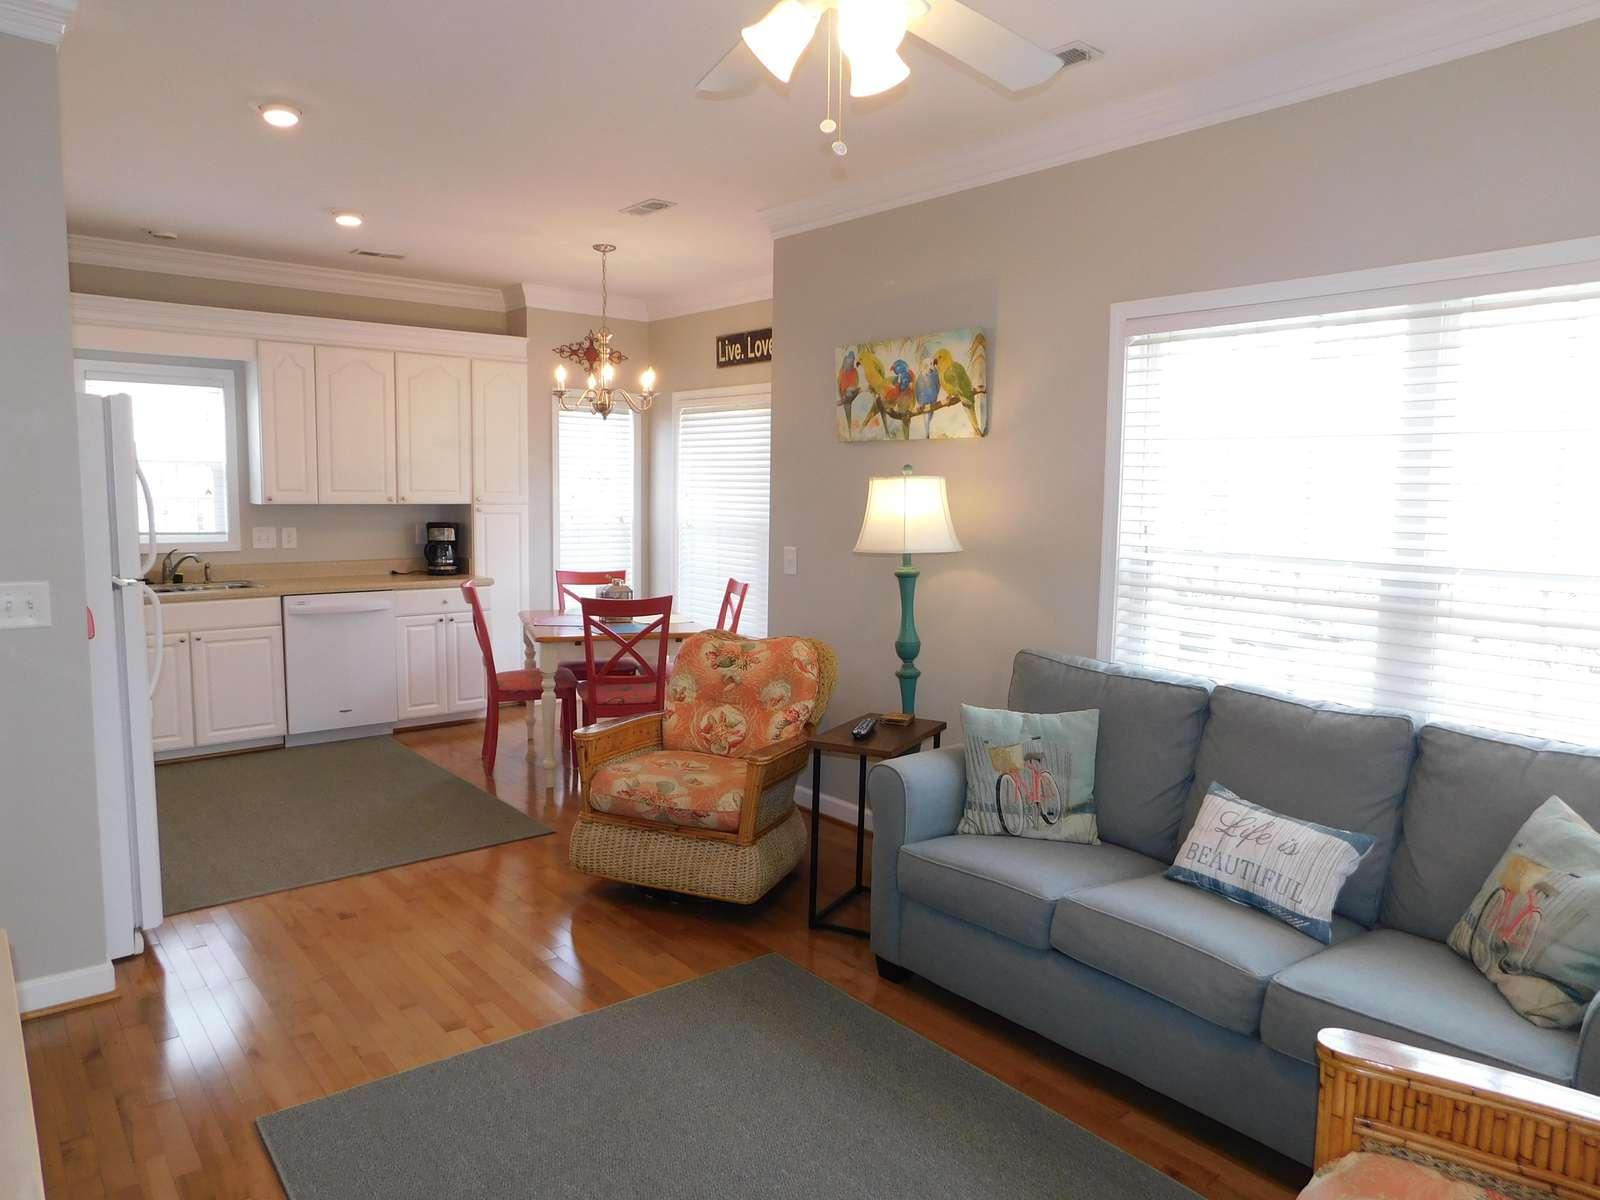 Nice cozy living area